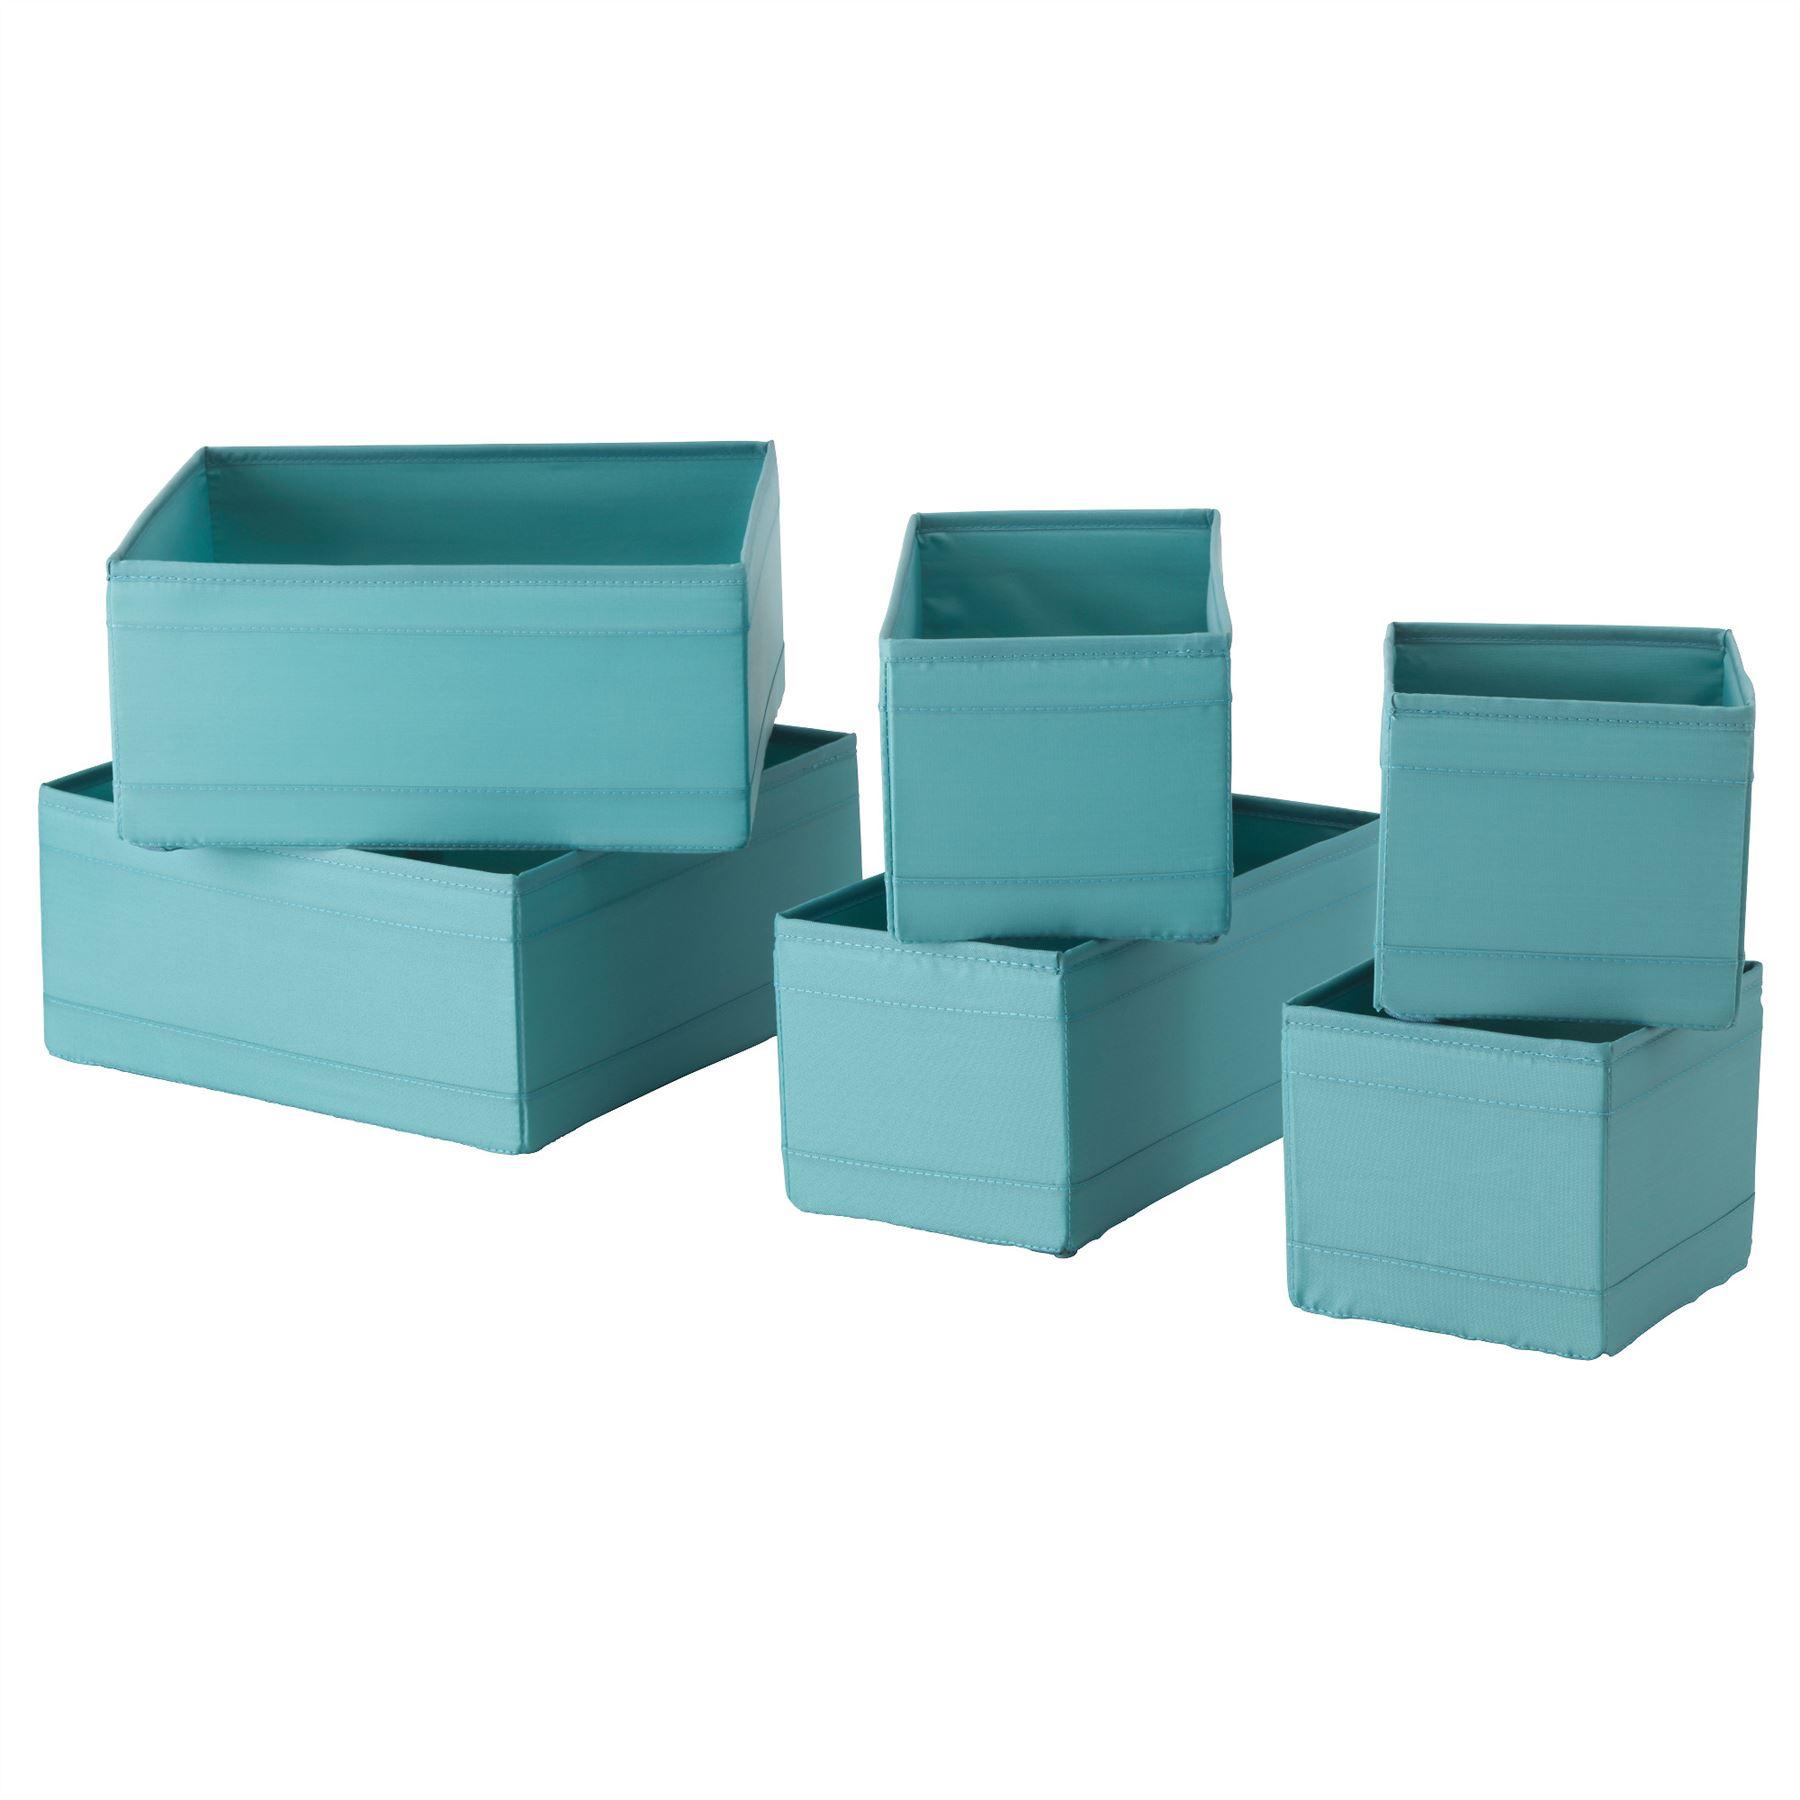 ikea skubb set of 6 storage box organizer wardrobe drawer. Black Bedroom Furniture Sets. Home Design Ideas